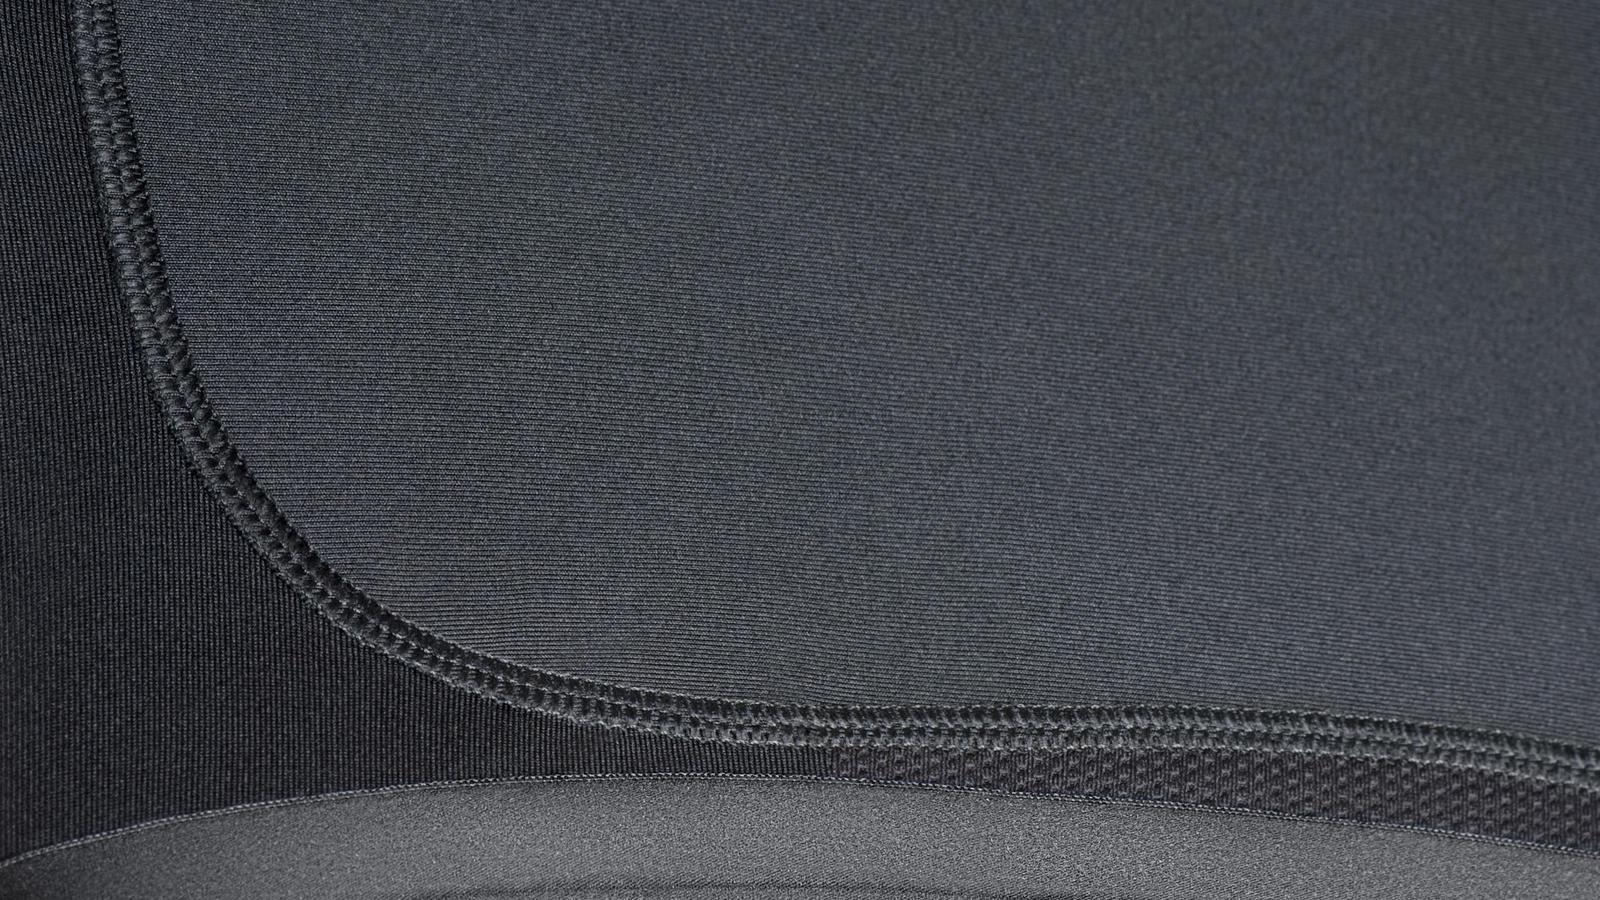 Nike_Victory_Contour_Bra_Cup_Construction_Detail